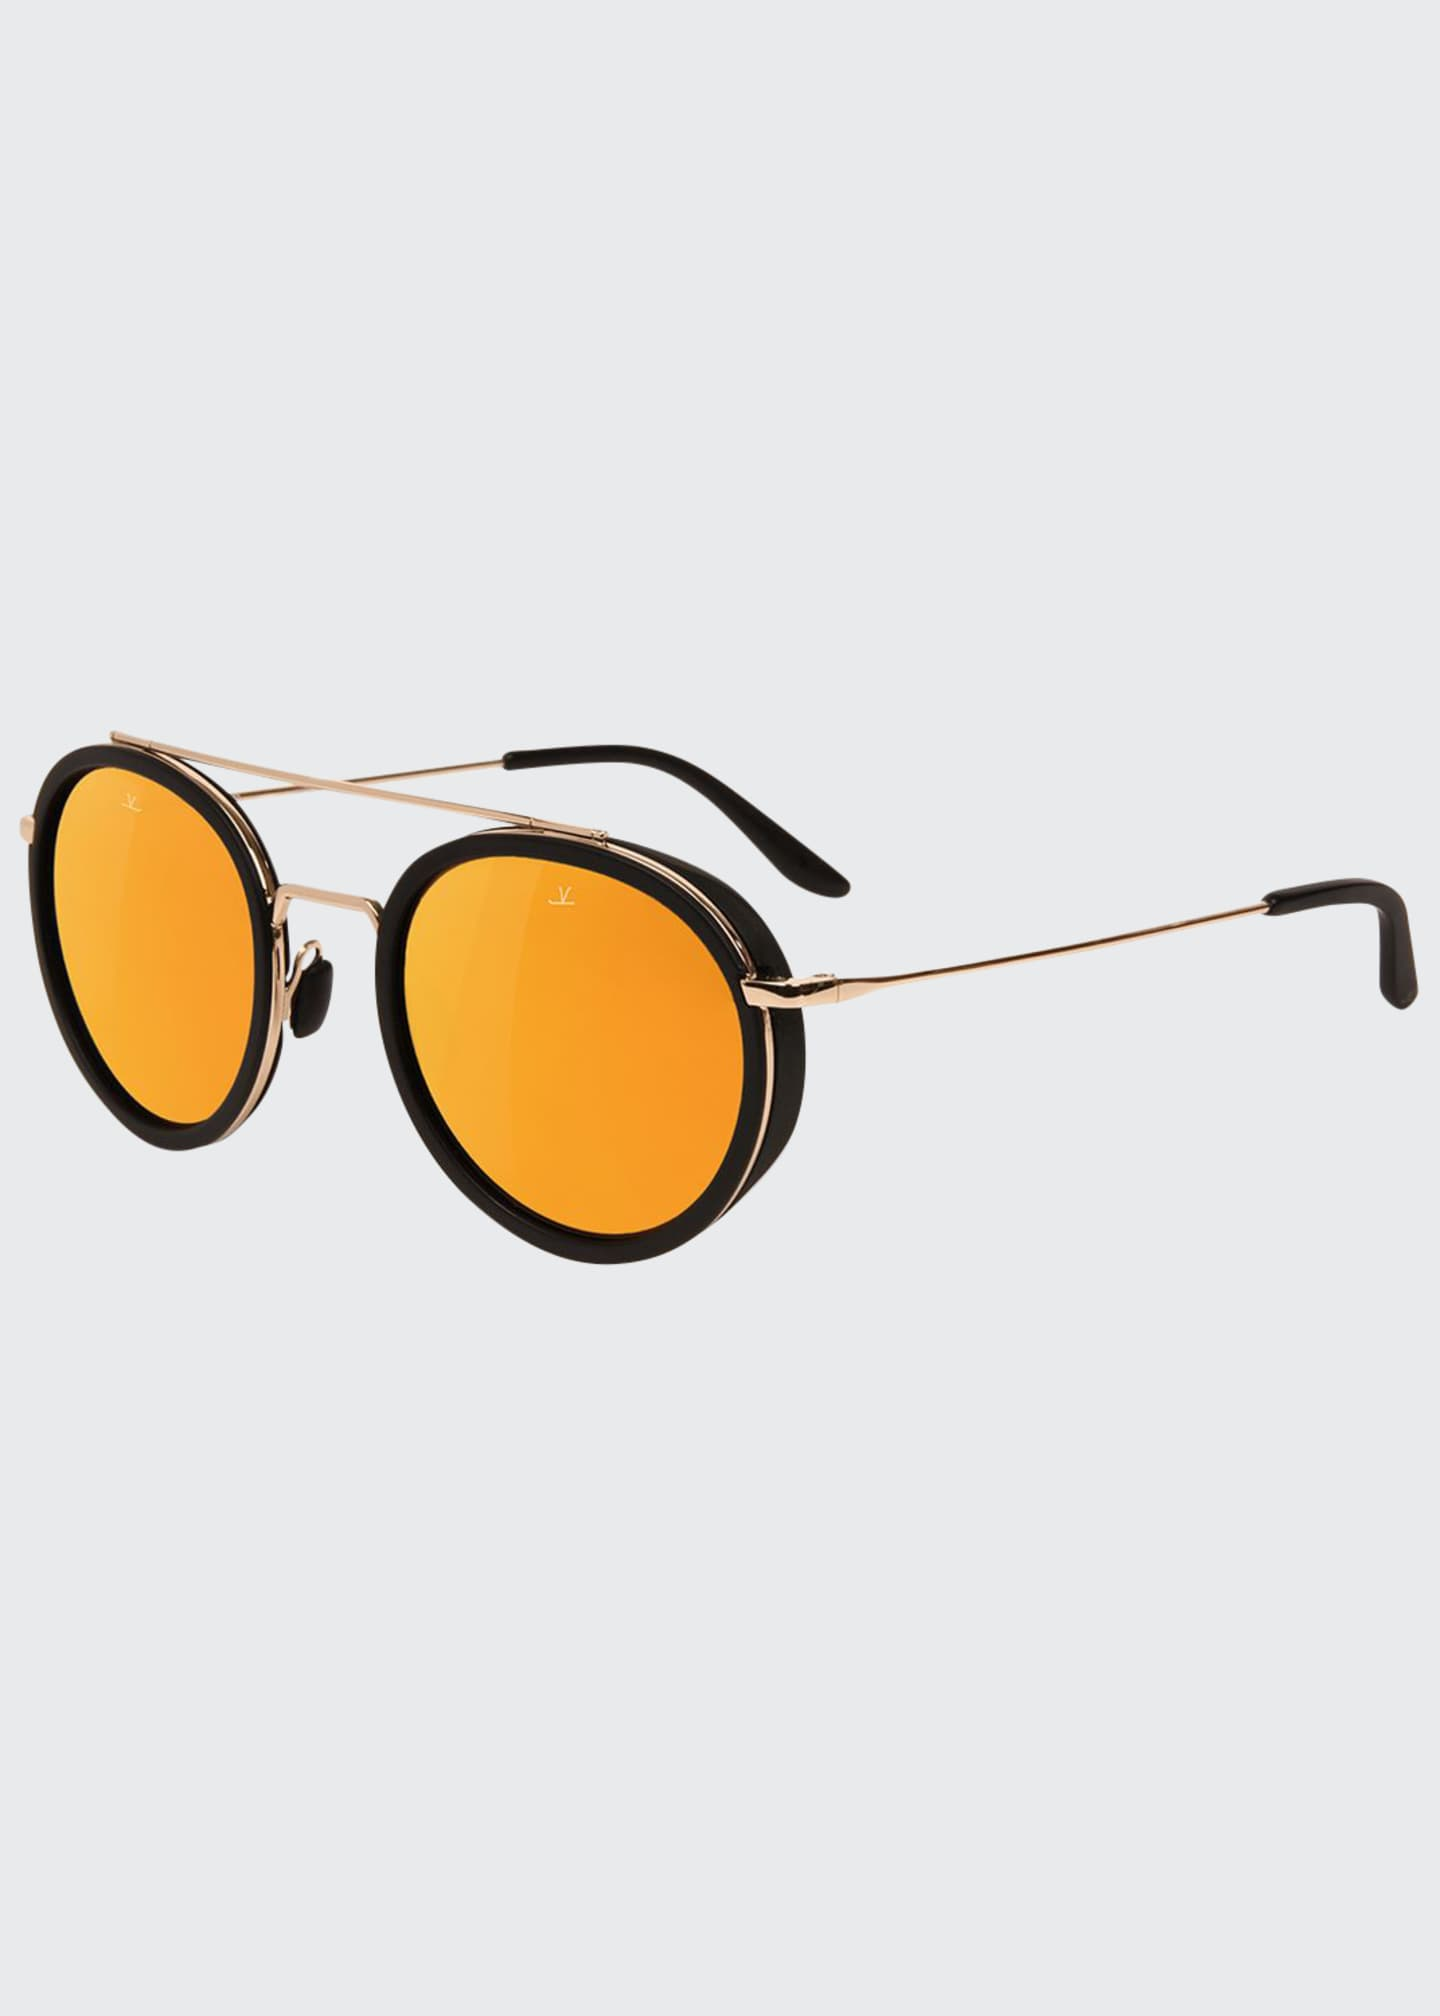 Vuarnet Men's Edge Round Stainless Steel/Acetate Sunglasses